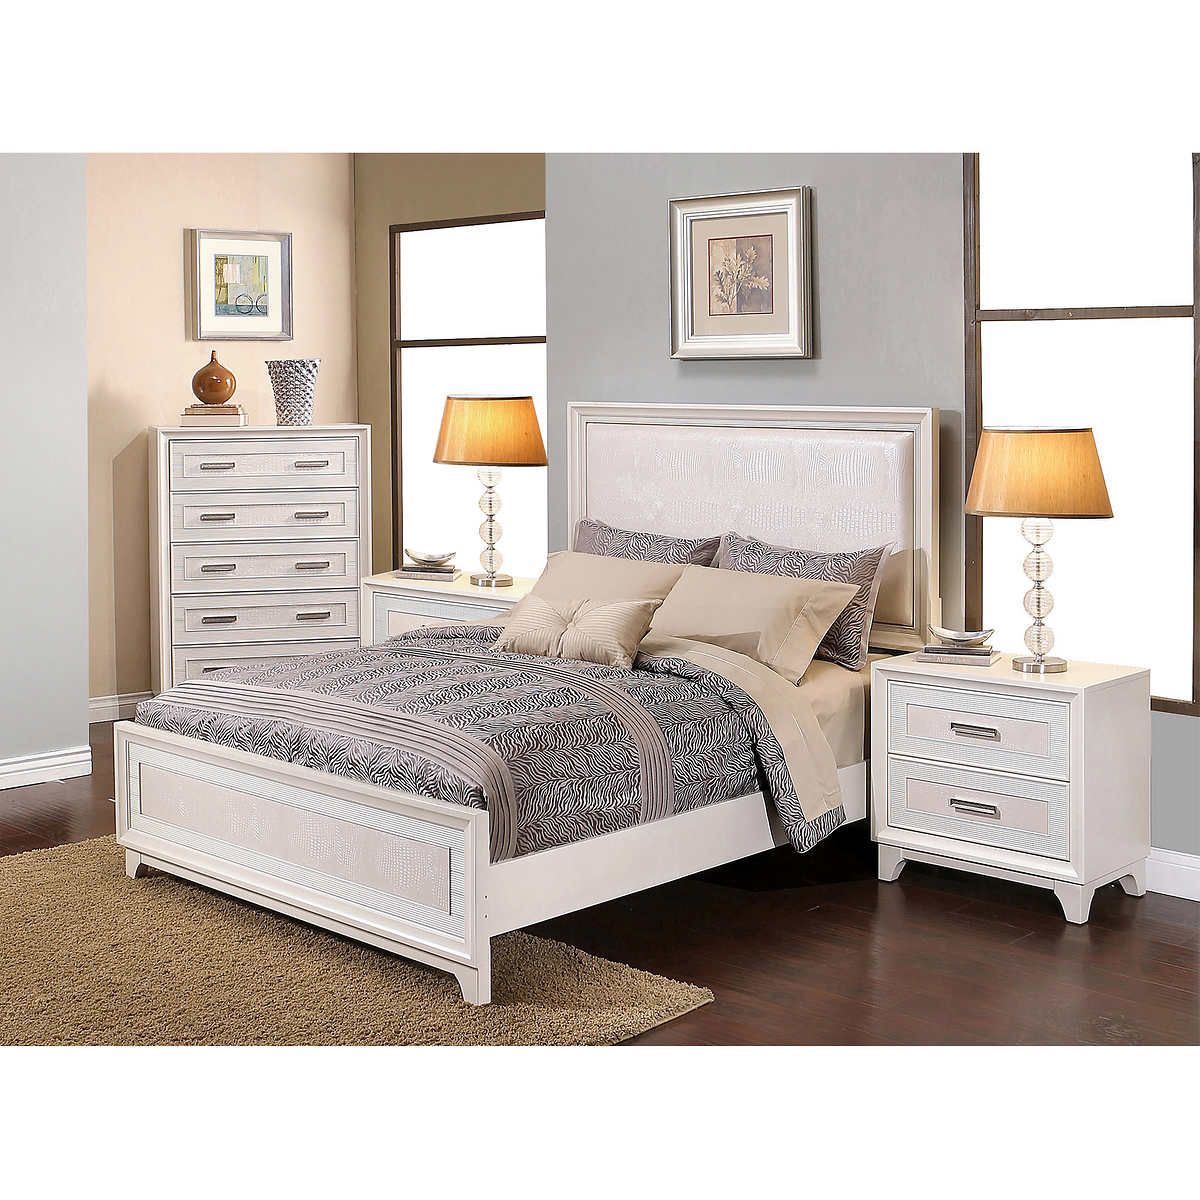 California King Bedroom Set.California King Bedroom Set. California ...